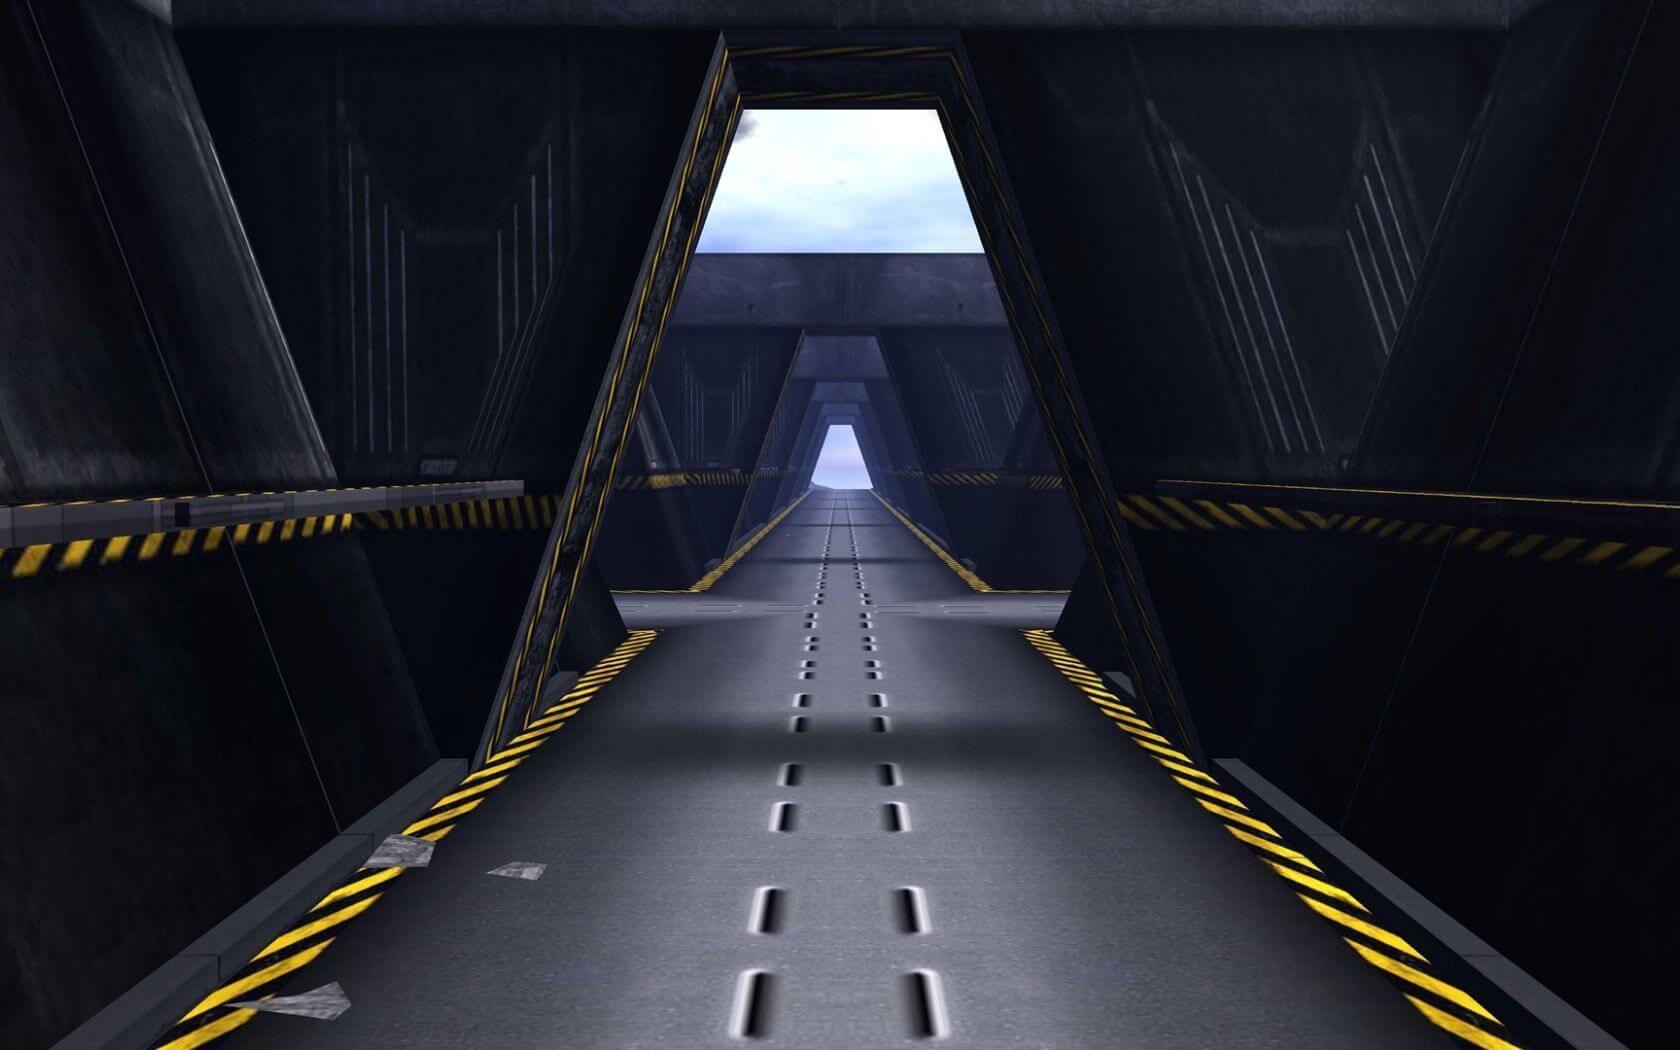 How IoT, AI, Blockchain & AR are Revolutionizing Traffic Management